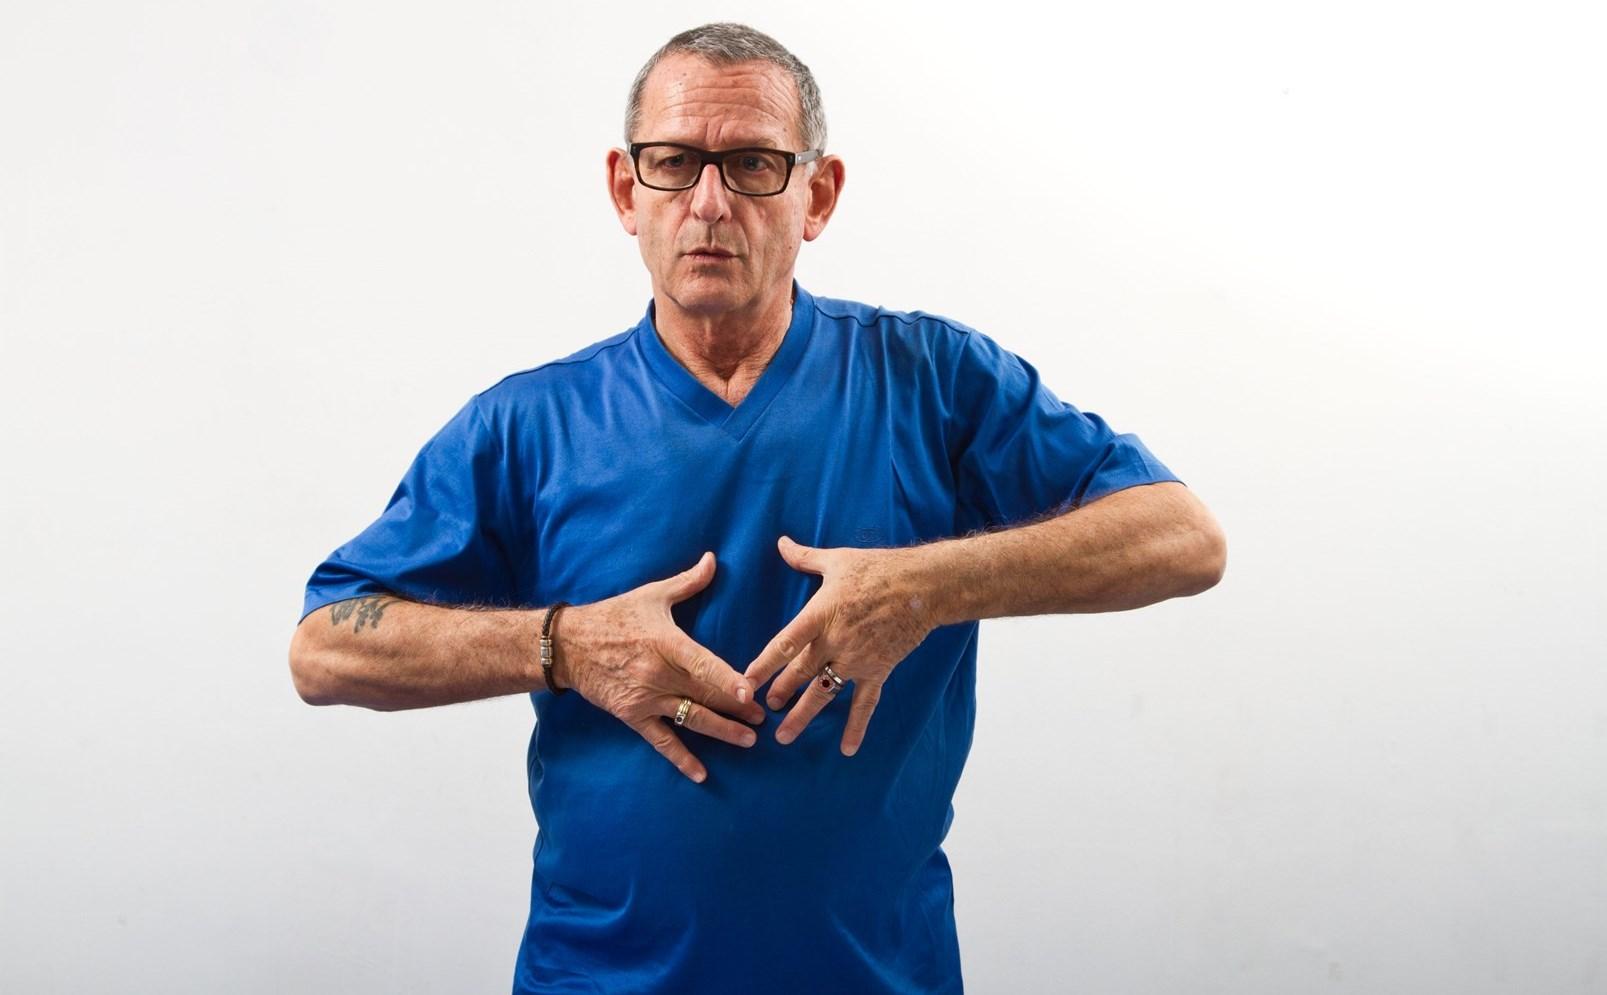 Movement and rhythm exercises can alleviate Parkinson's symptoms, says Alex Kerten. Photo by Debbie Zimelman